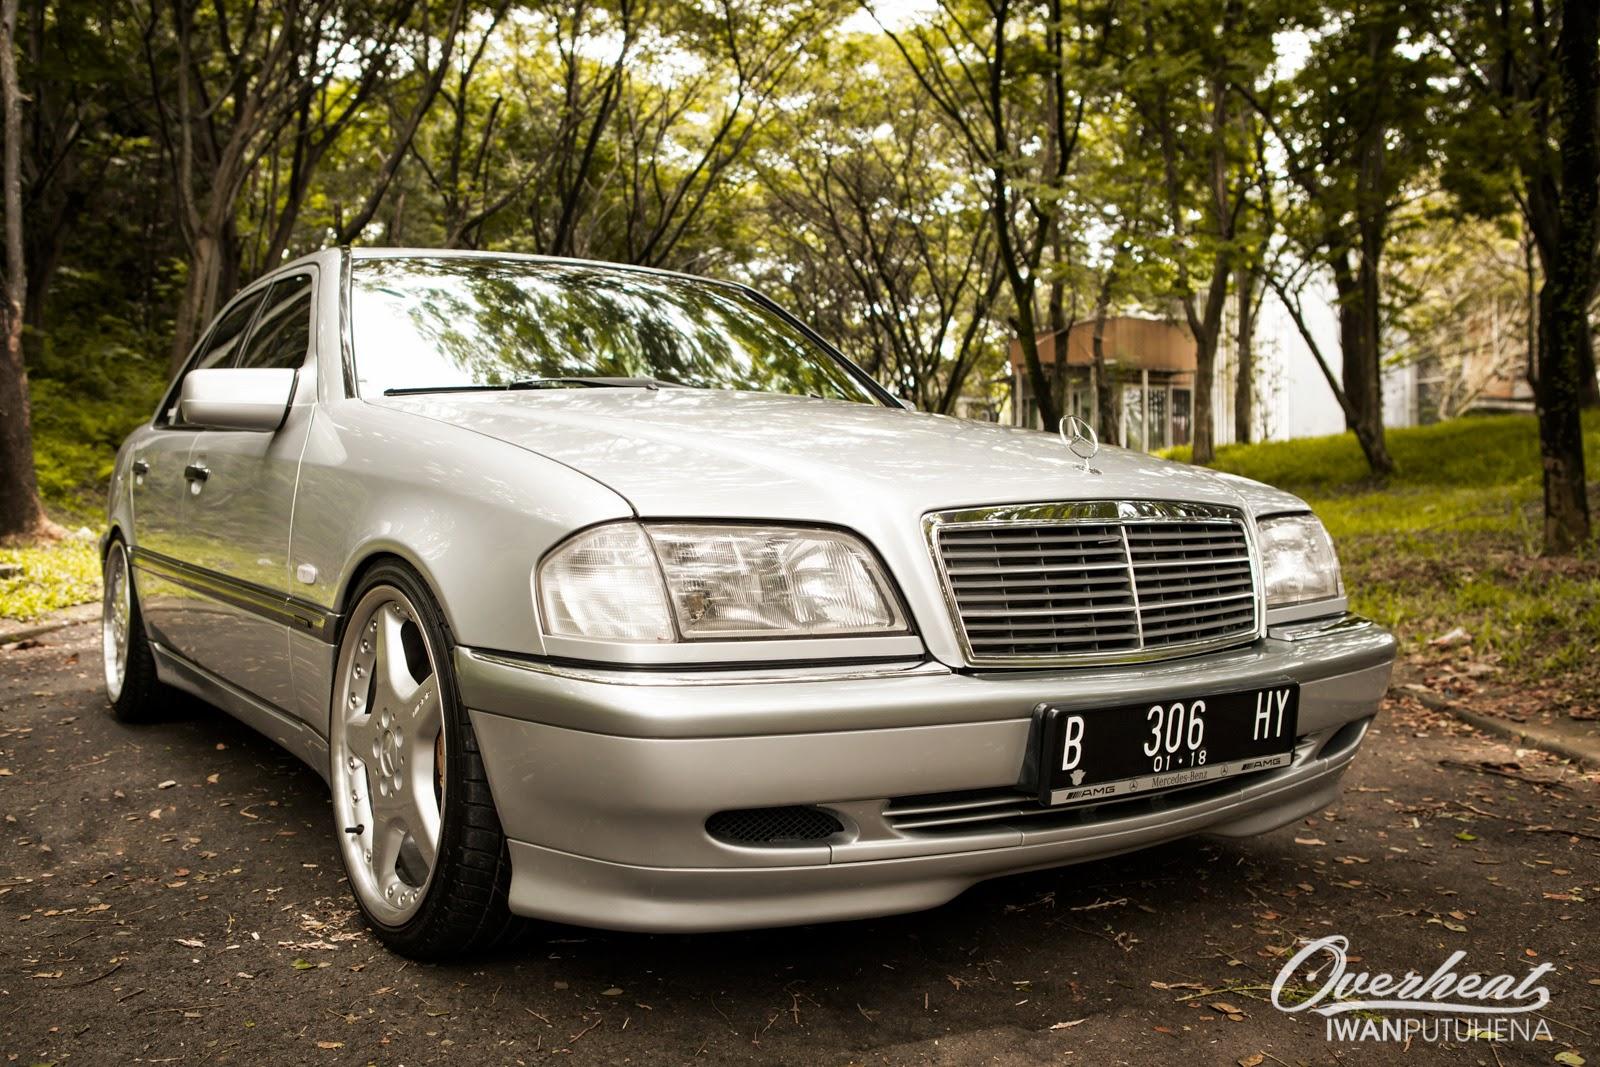 Yudha s mercedes benz w202 sedan c230 1998 a for Mercedes benz c230